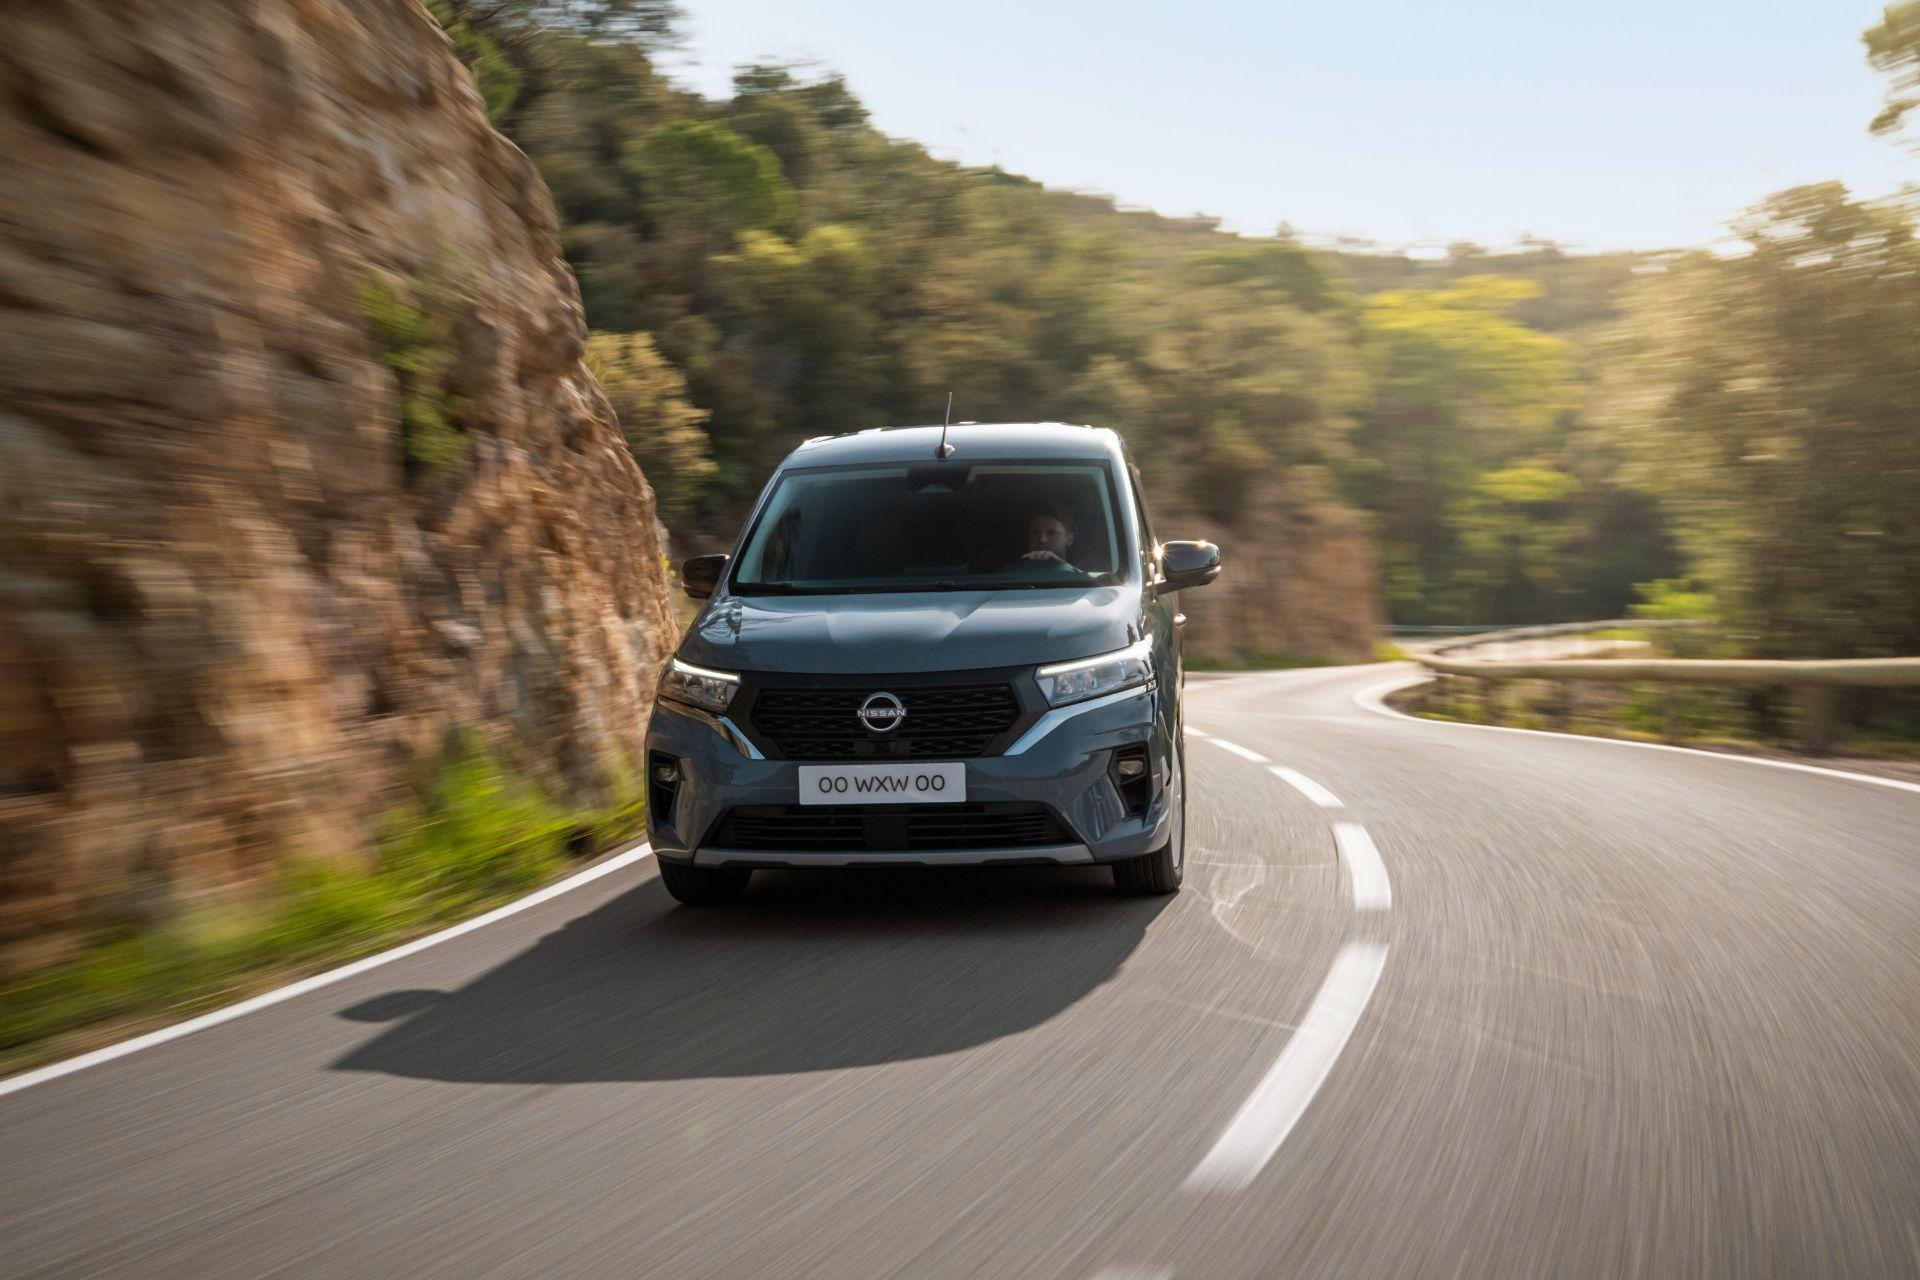 2022-Nissan-Townstar-petrol-van-dynamic-4